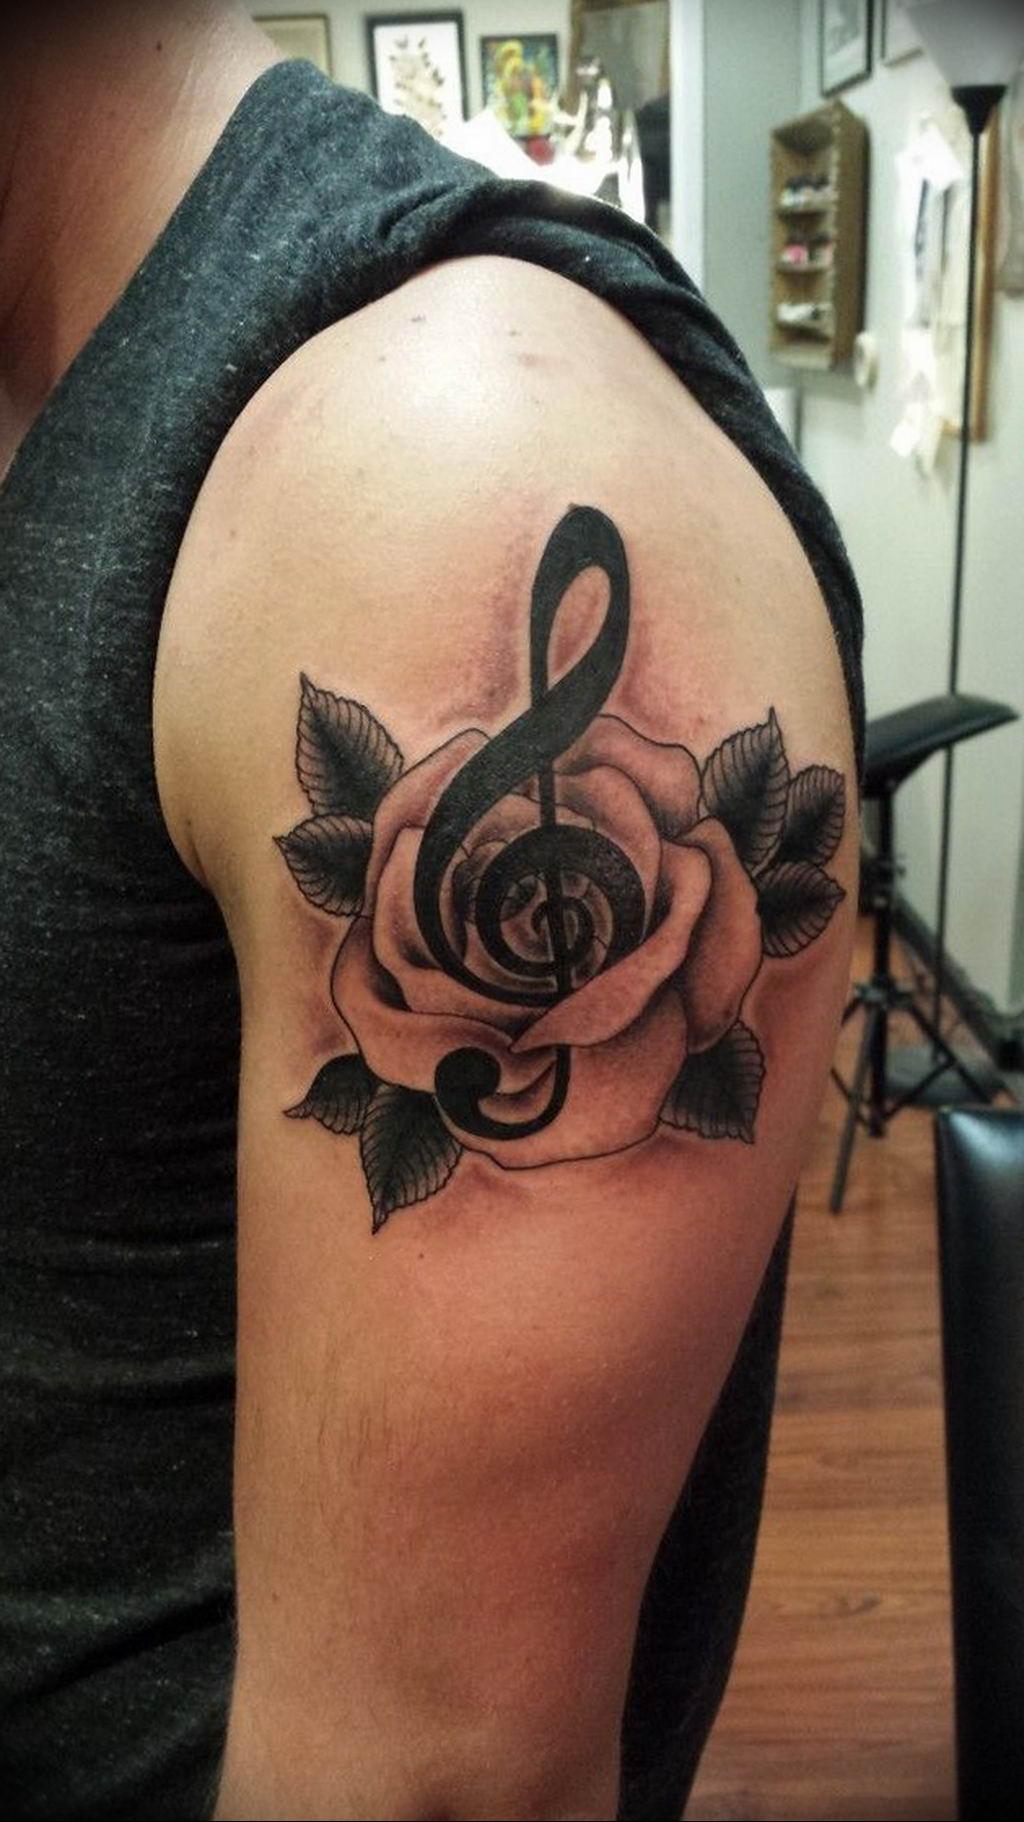 Фото скрипичный ключ тату 21.08.2019 №020 - treble clef tattoo - tatufoto.com